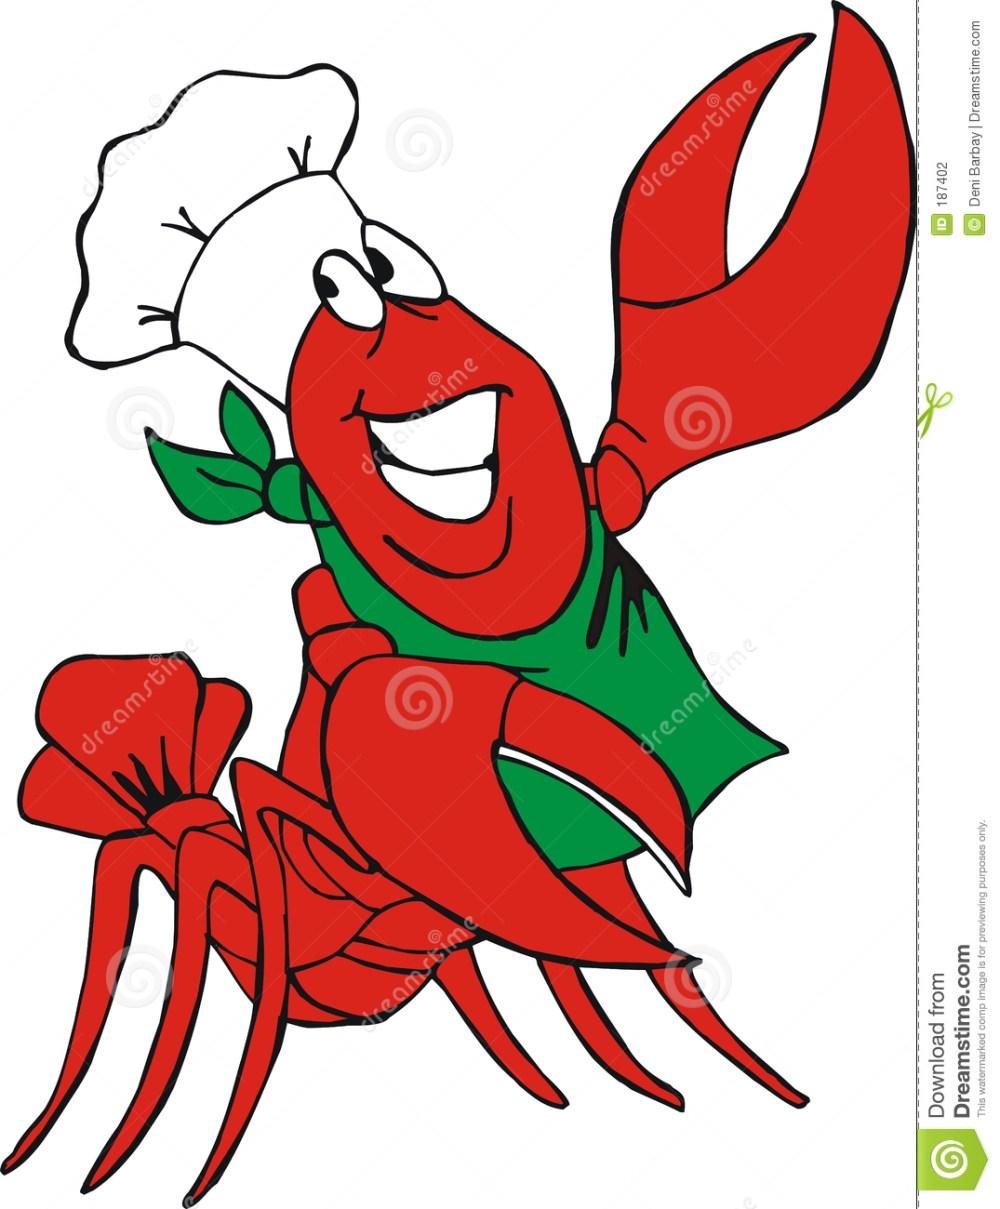 medium resolution of crawfish clip art free